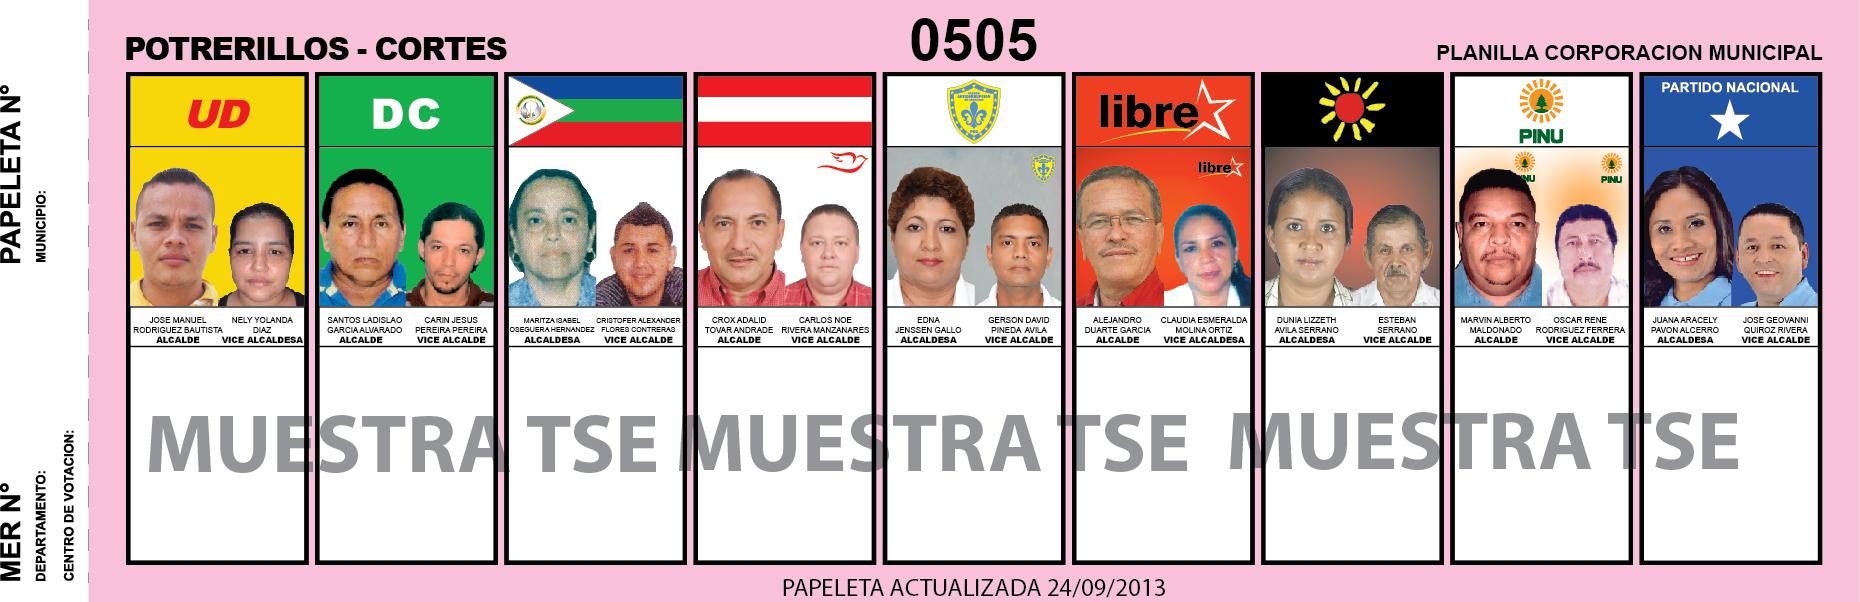 CANDIDATOS 2013 MUNICIPIO POTRERILLOS - CORTES - HONDURAS